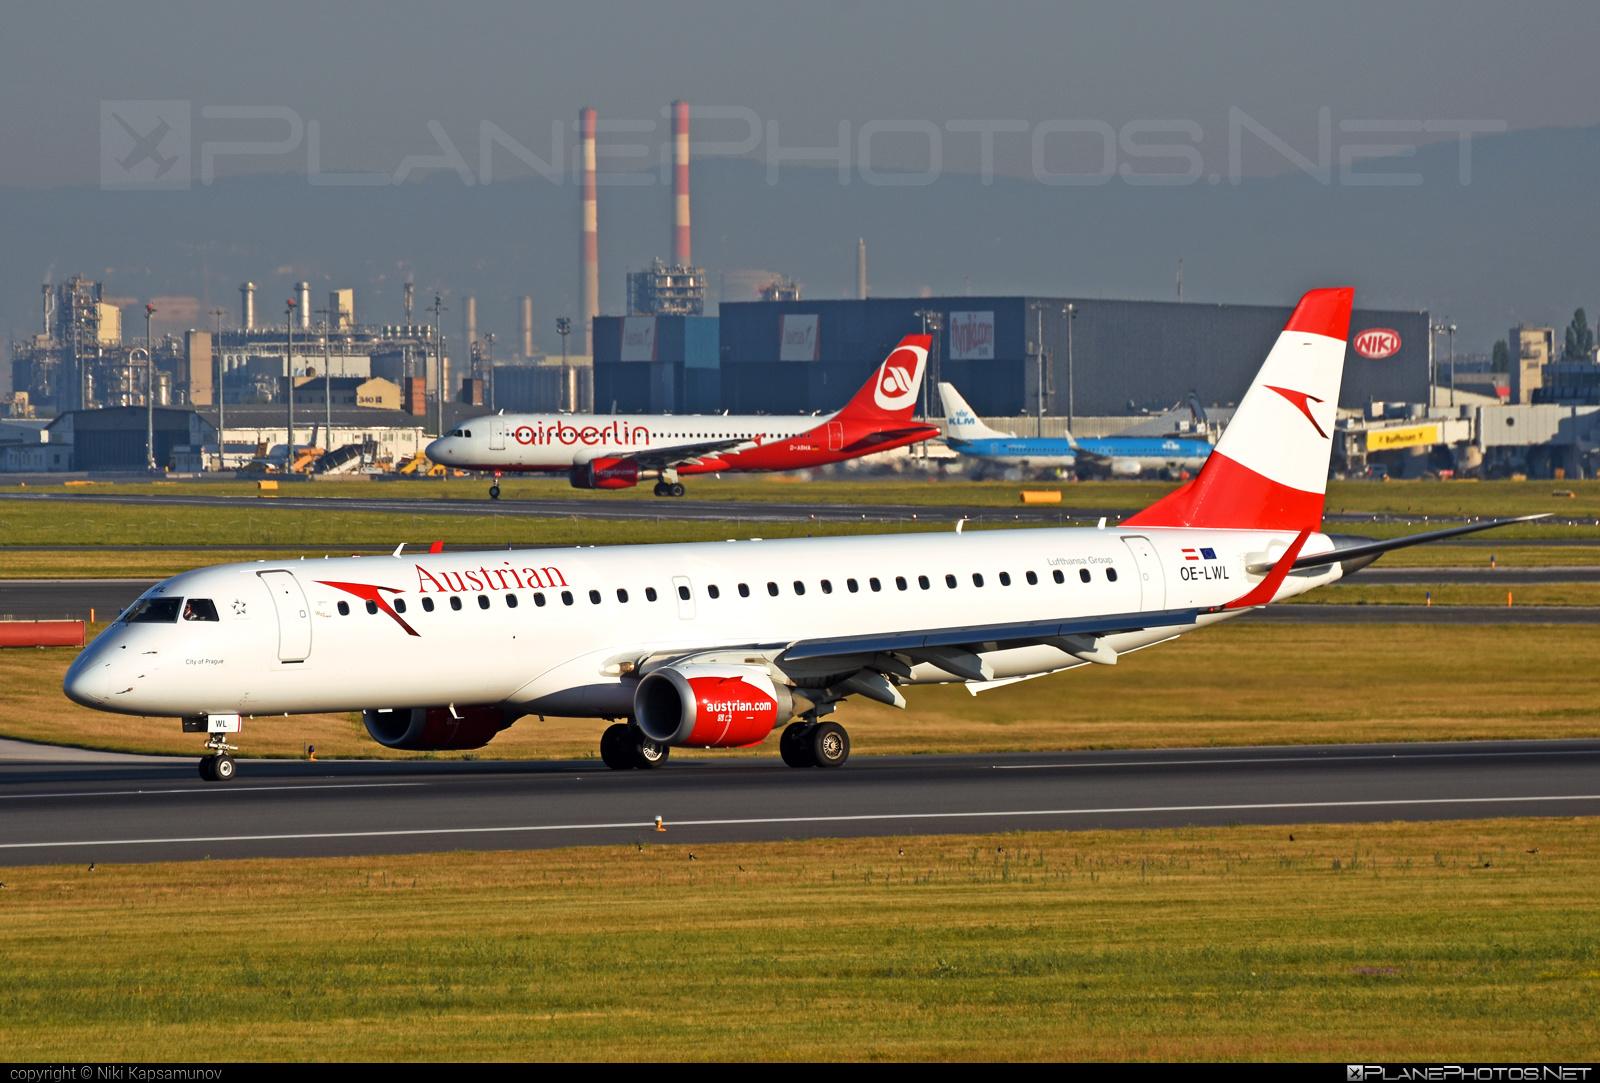 Embraer E195LR (ERJ-190-200LR) - OE-LWL operated by Austrian Airlines #e190 #e190200 #e190200lr #e195lr #embraer #embraer190200lr #embraer195 #embraer195lr